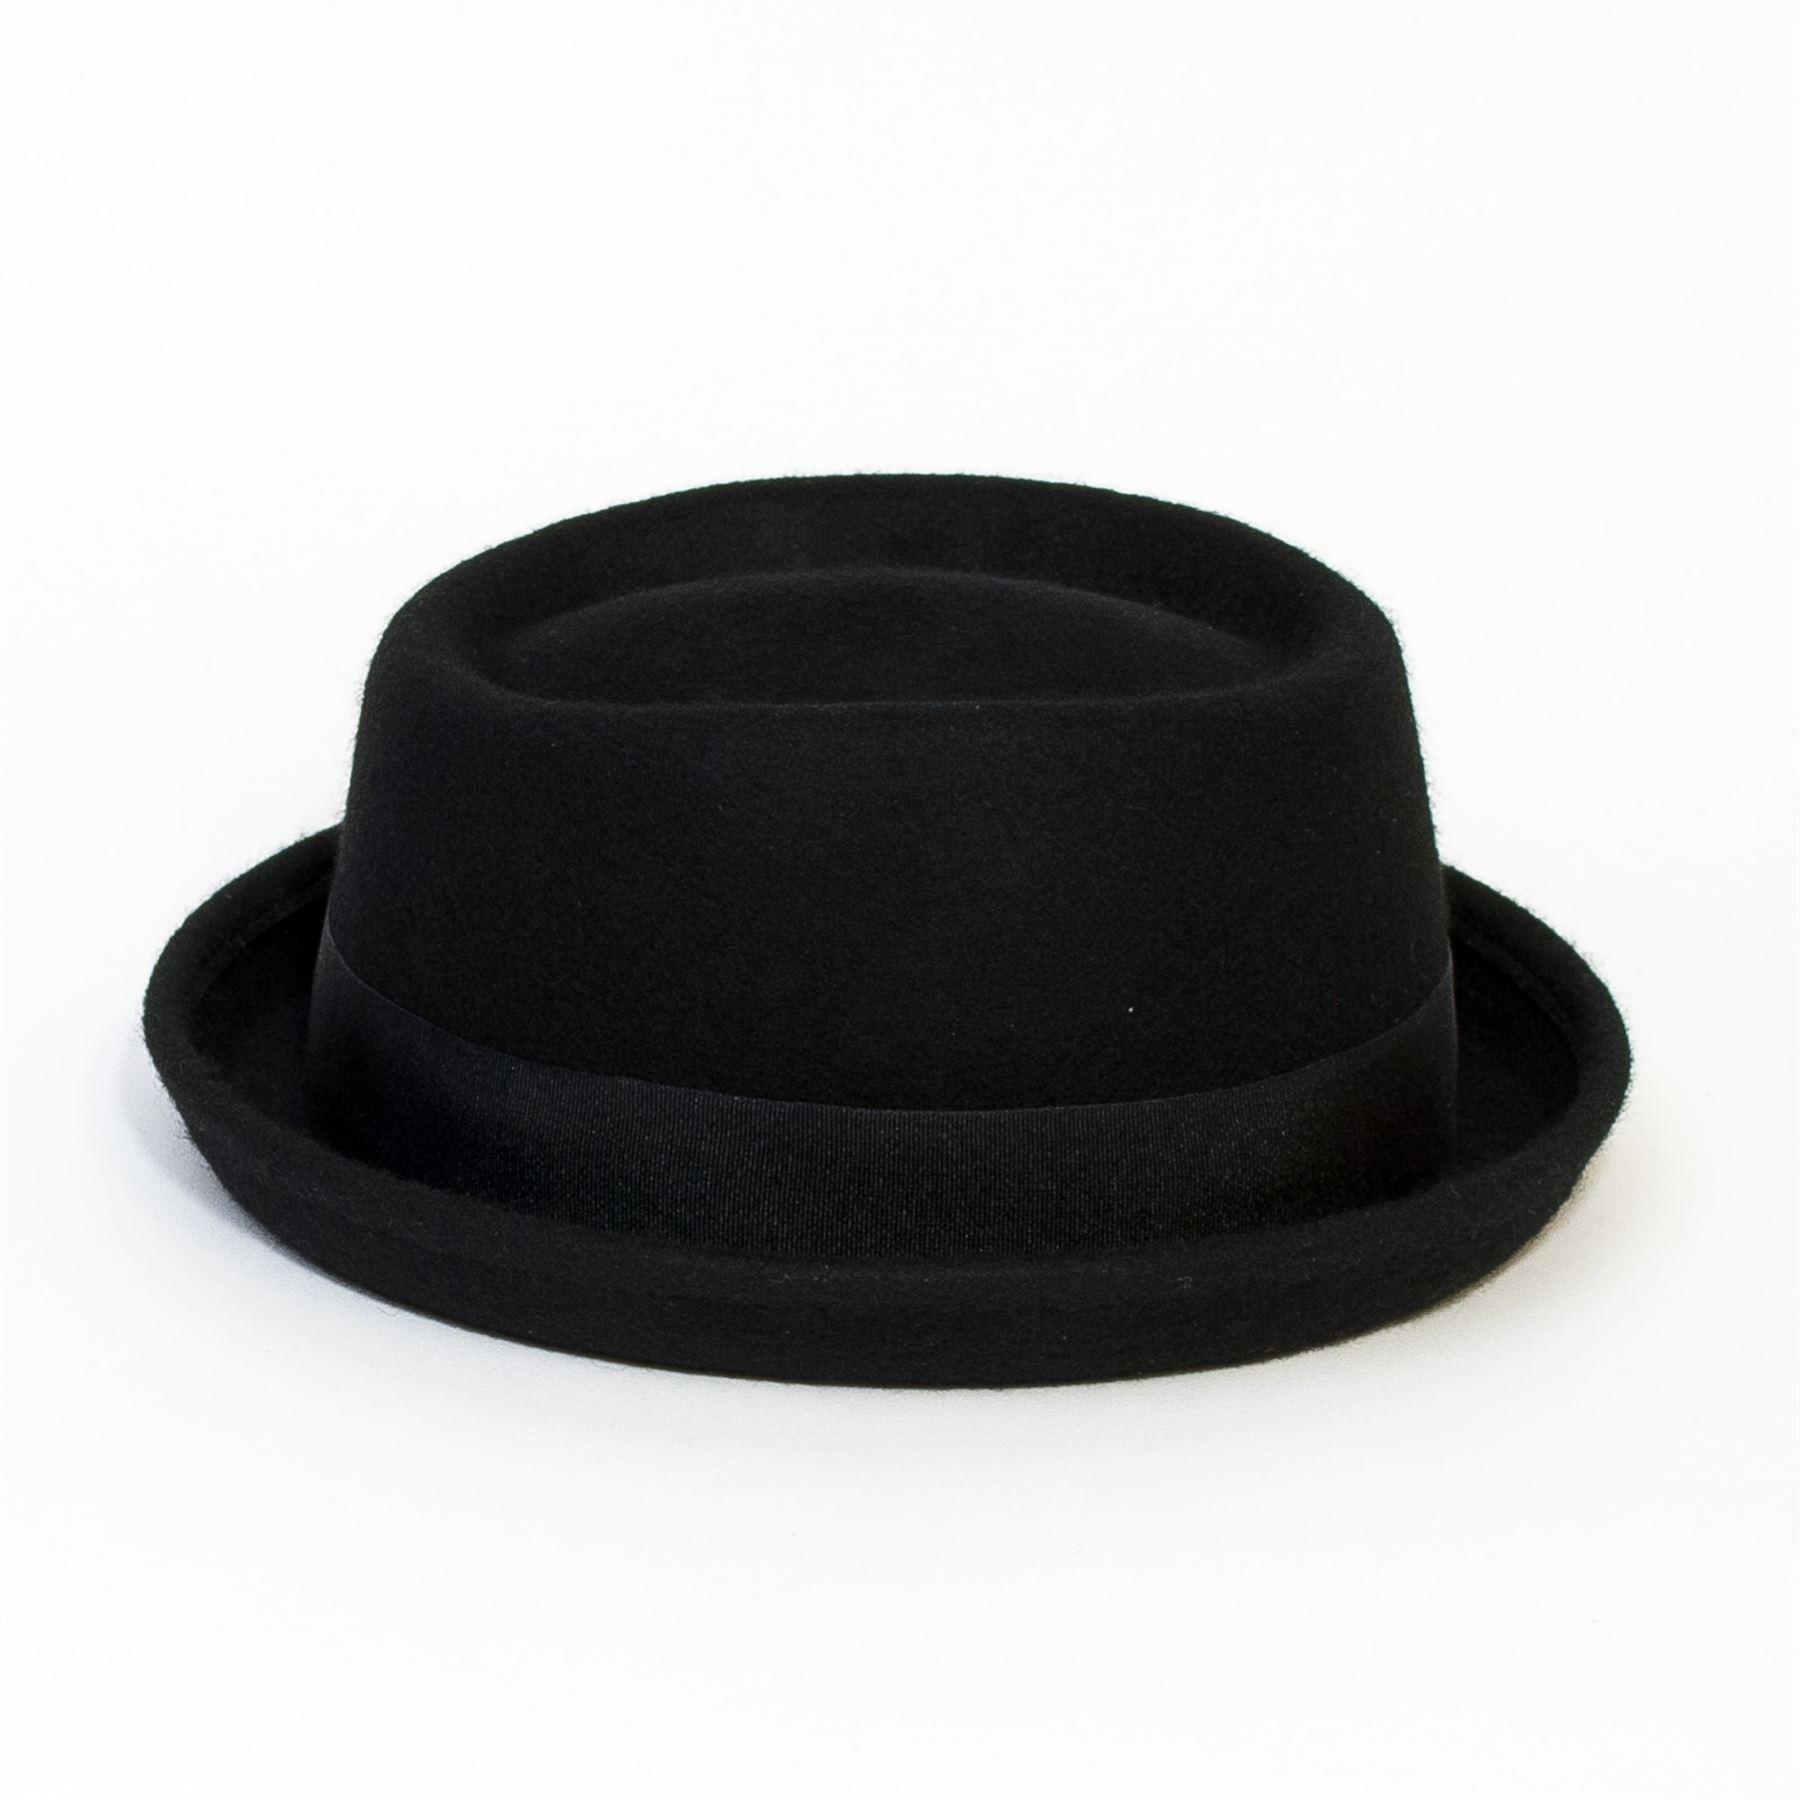 Plain Band Casual Pork Pie Hat